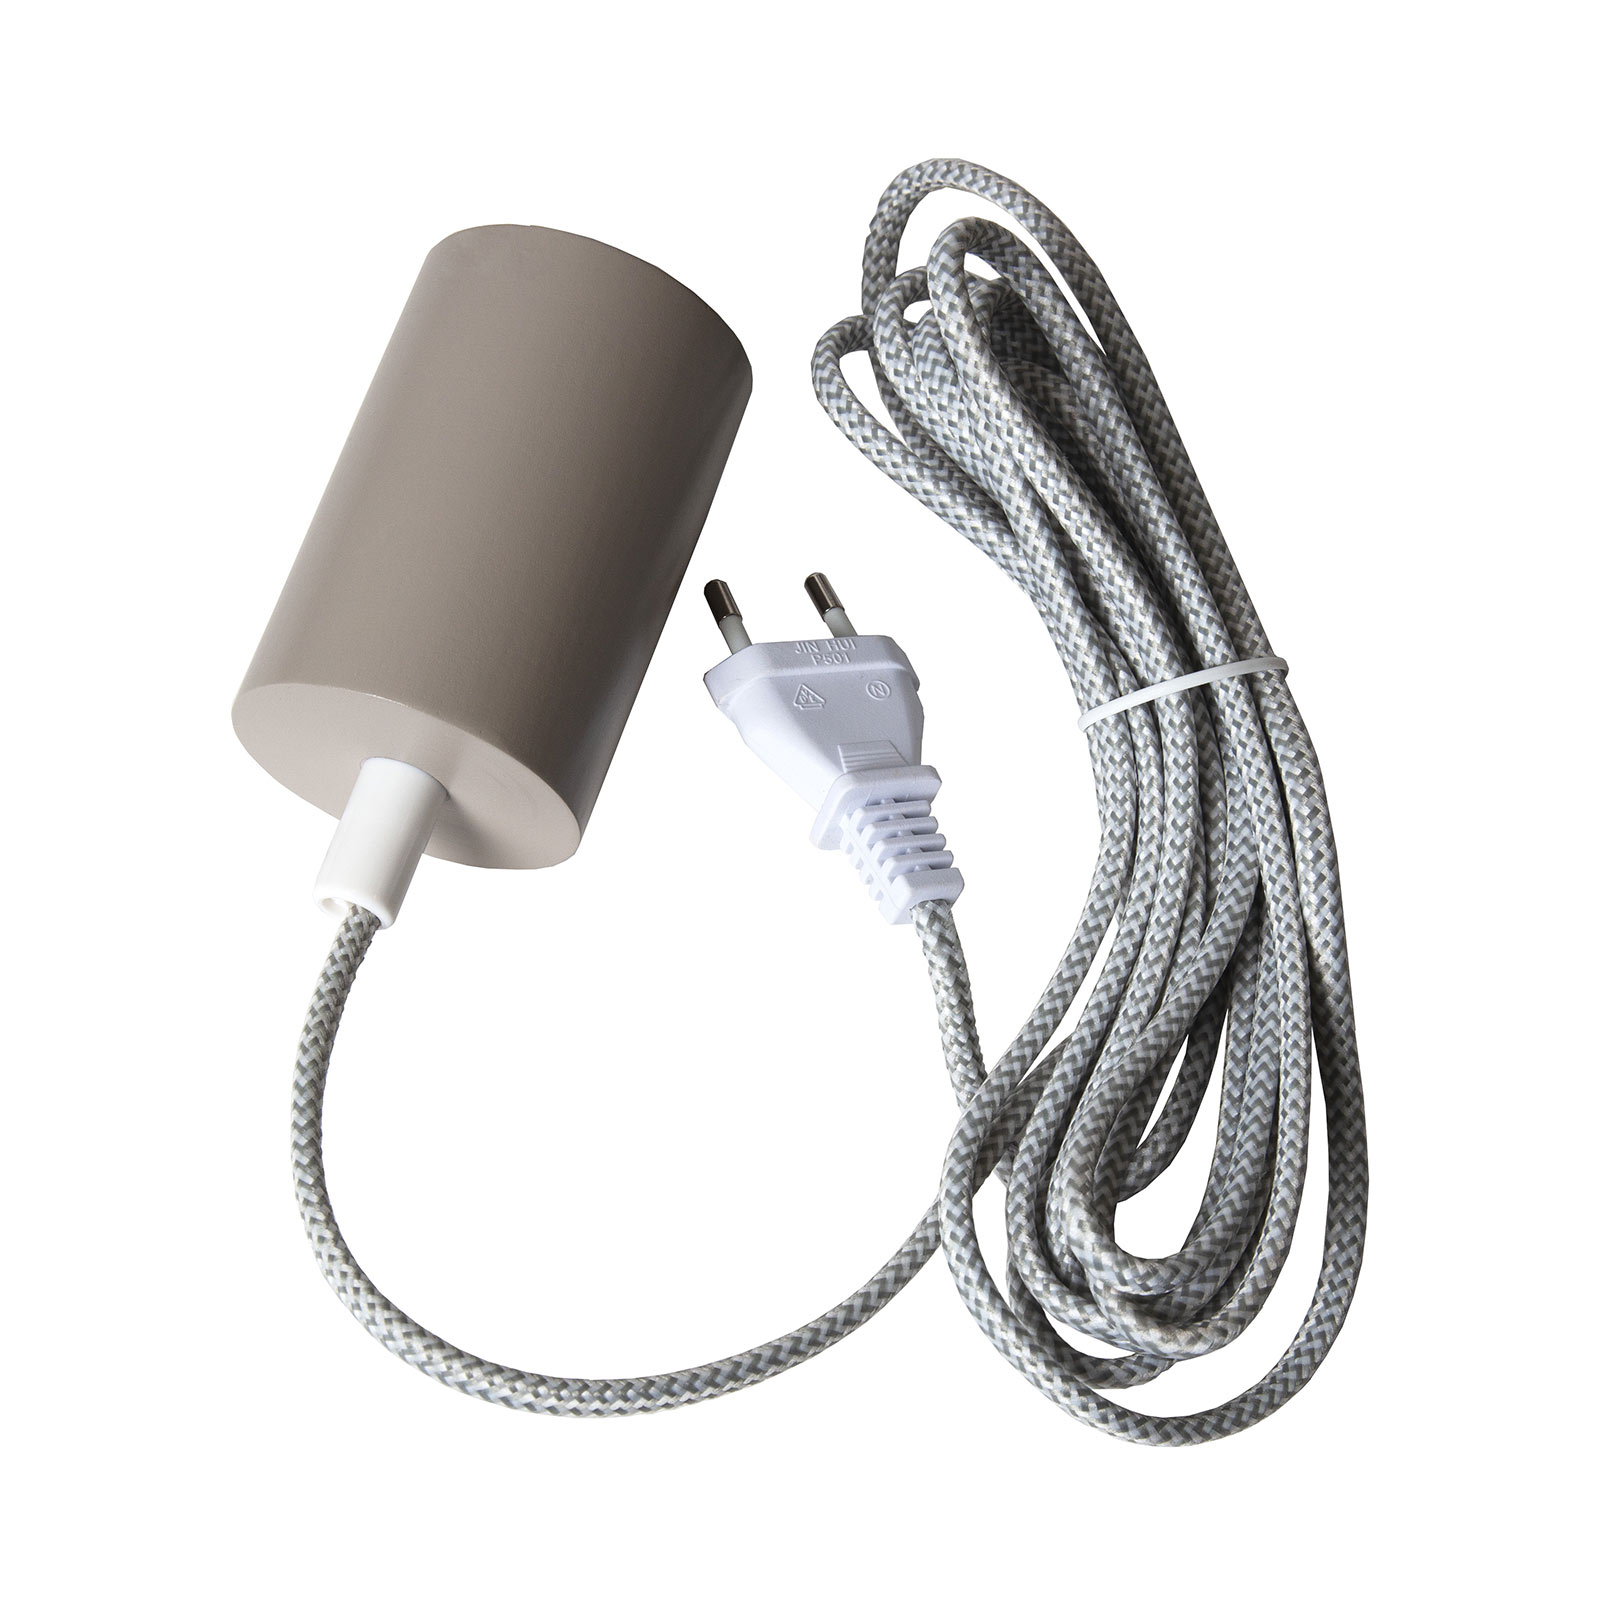 E27-Fassung Slim mit Kabel, grau